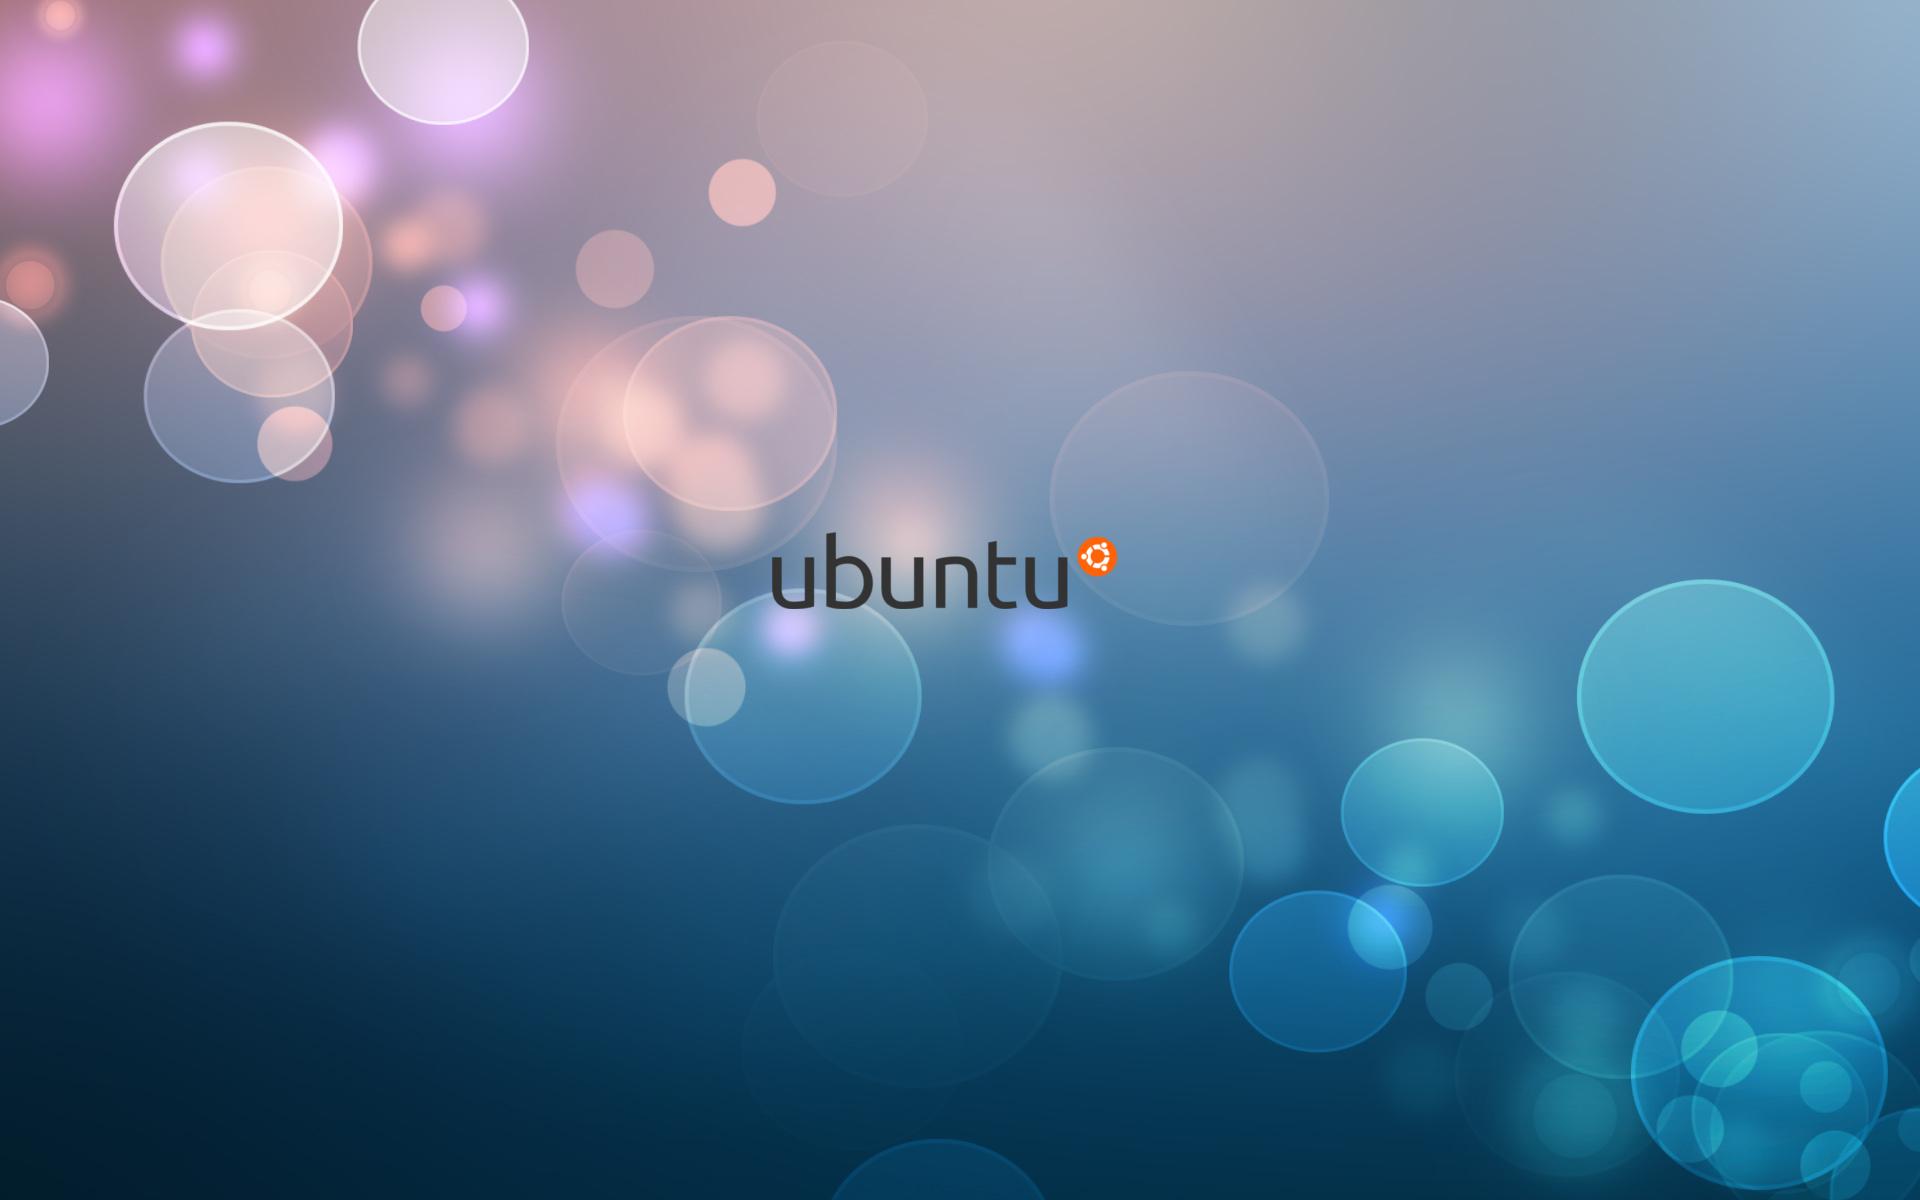 [48+] Ubuntu 14.04 Wallpapers 1920x1080 On WallpaperSafari